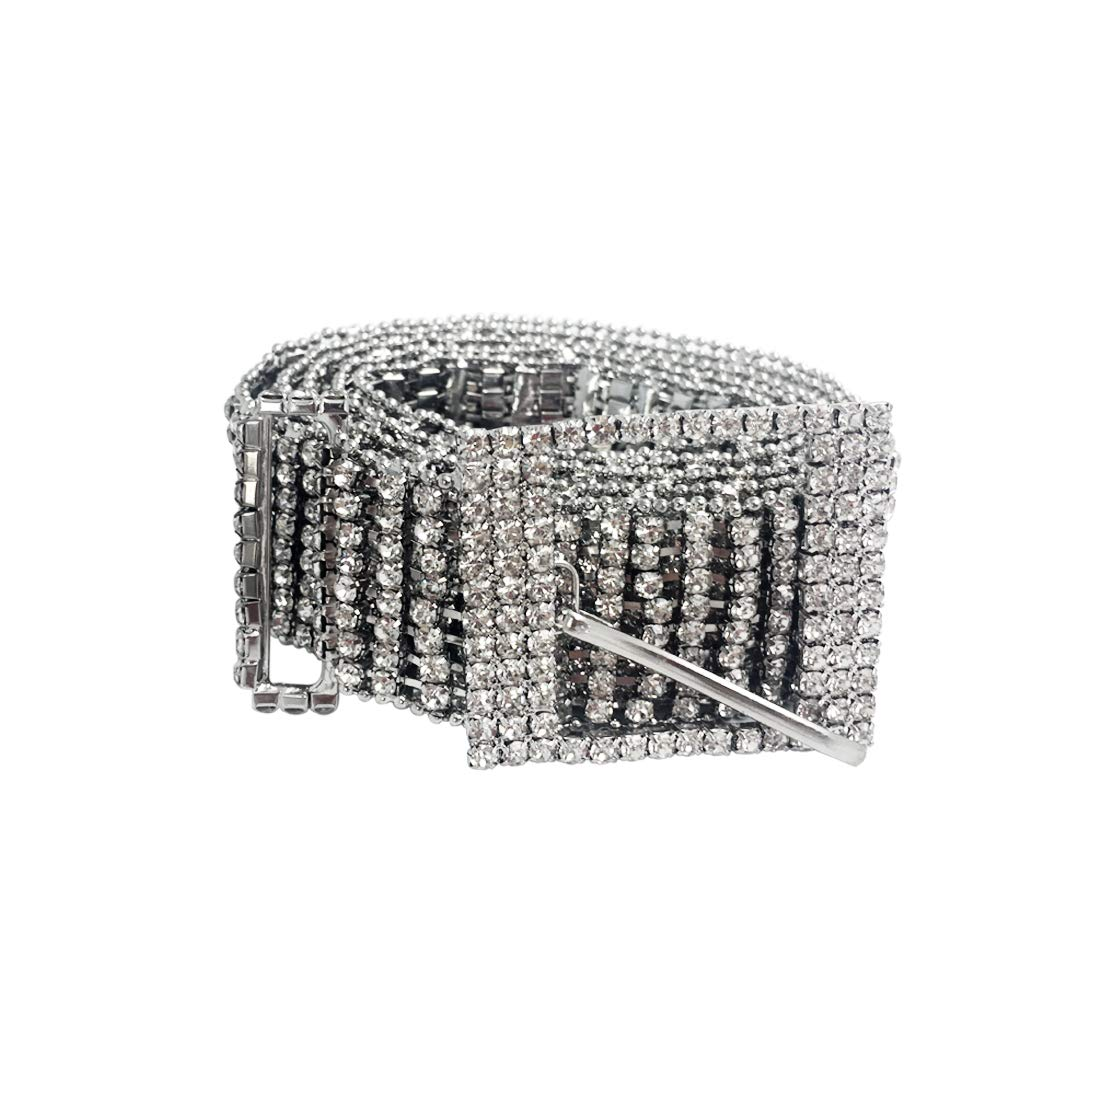 Womens Silver Crystal Rhinestone Chain Waist Buckle Belt Luxury Sparkling Sash Waistband Accessory